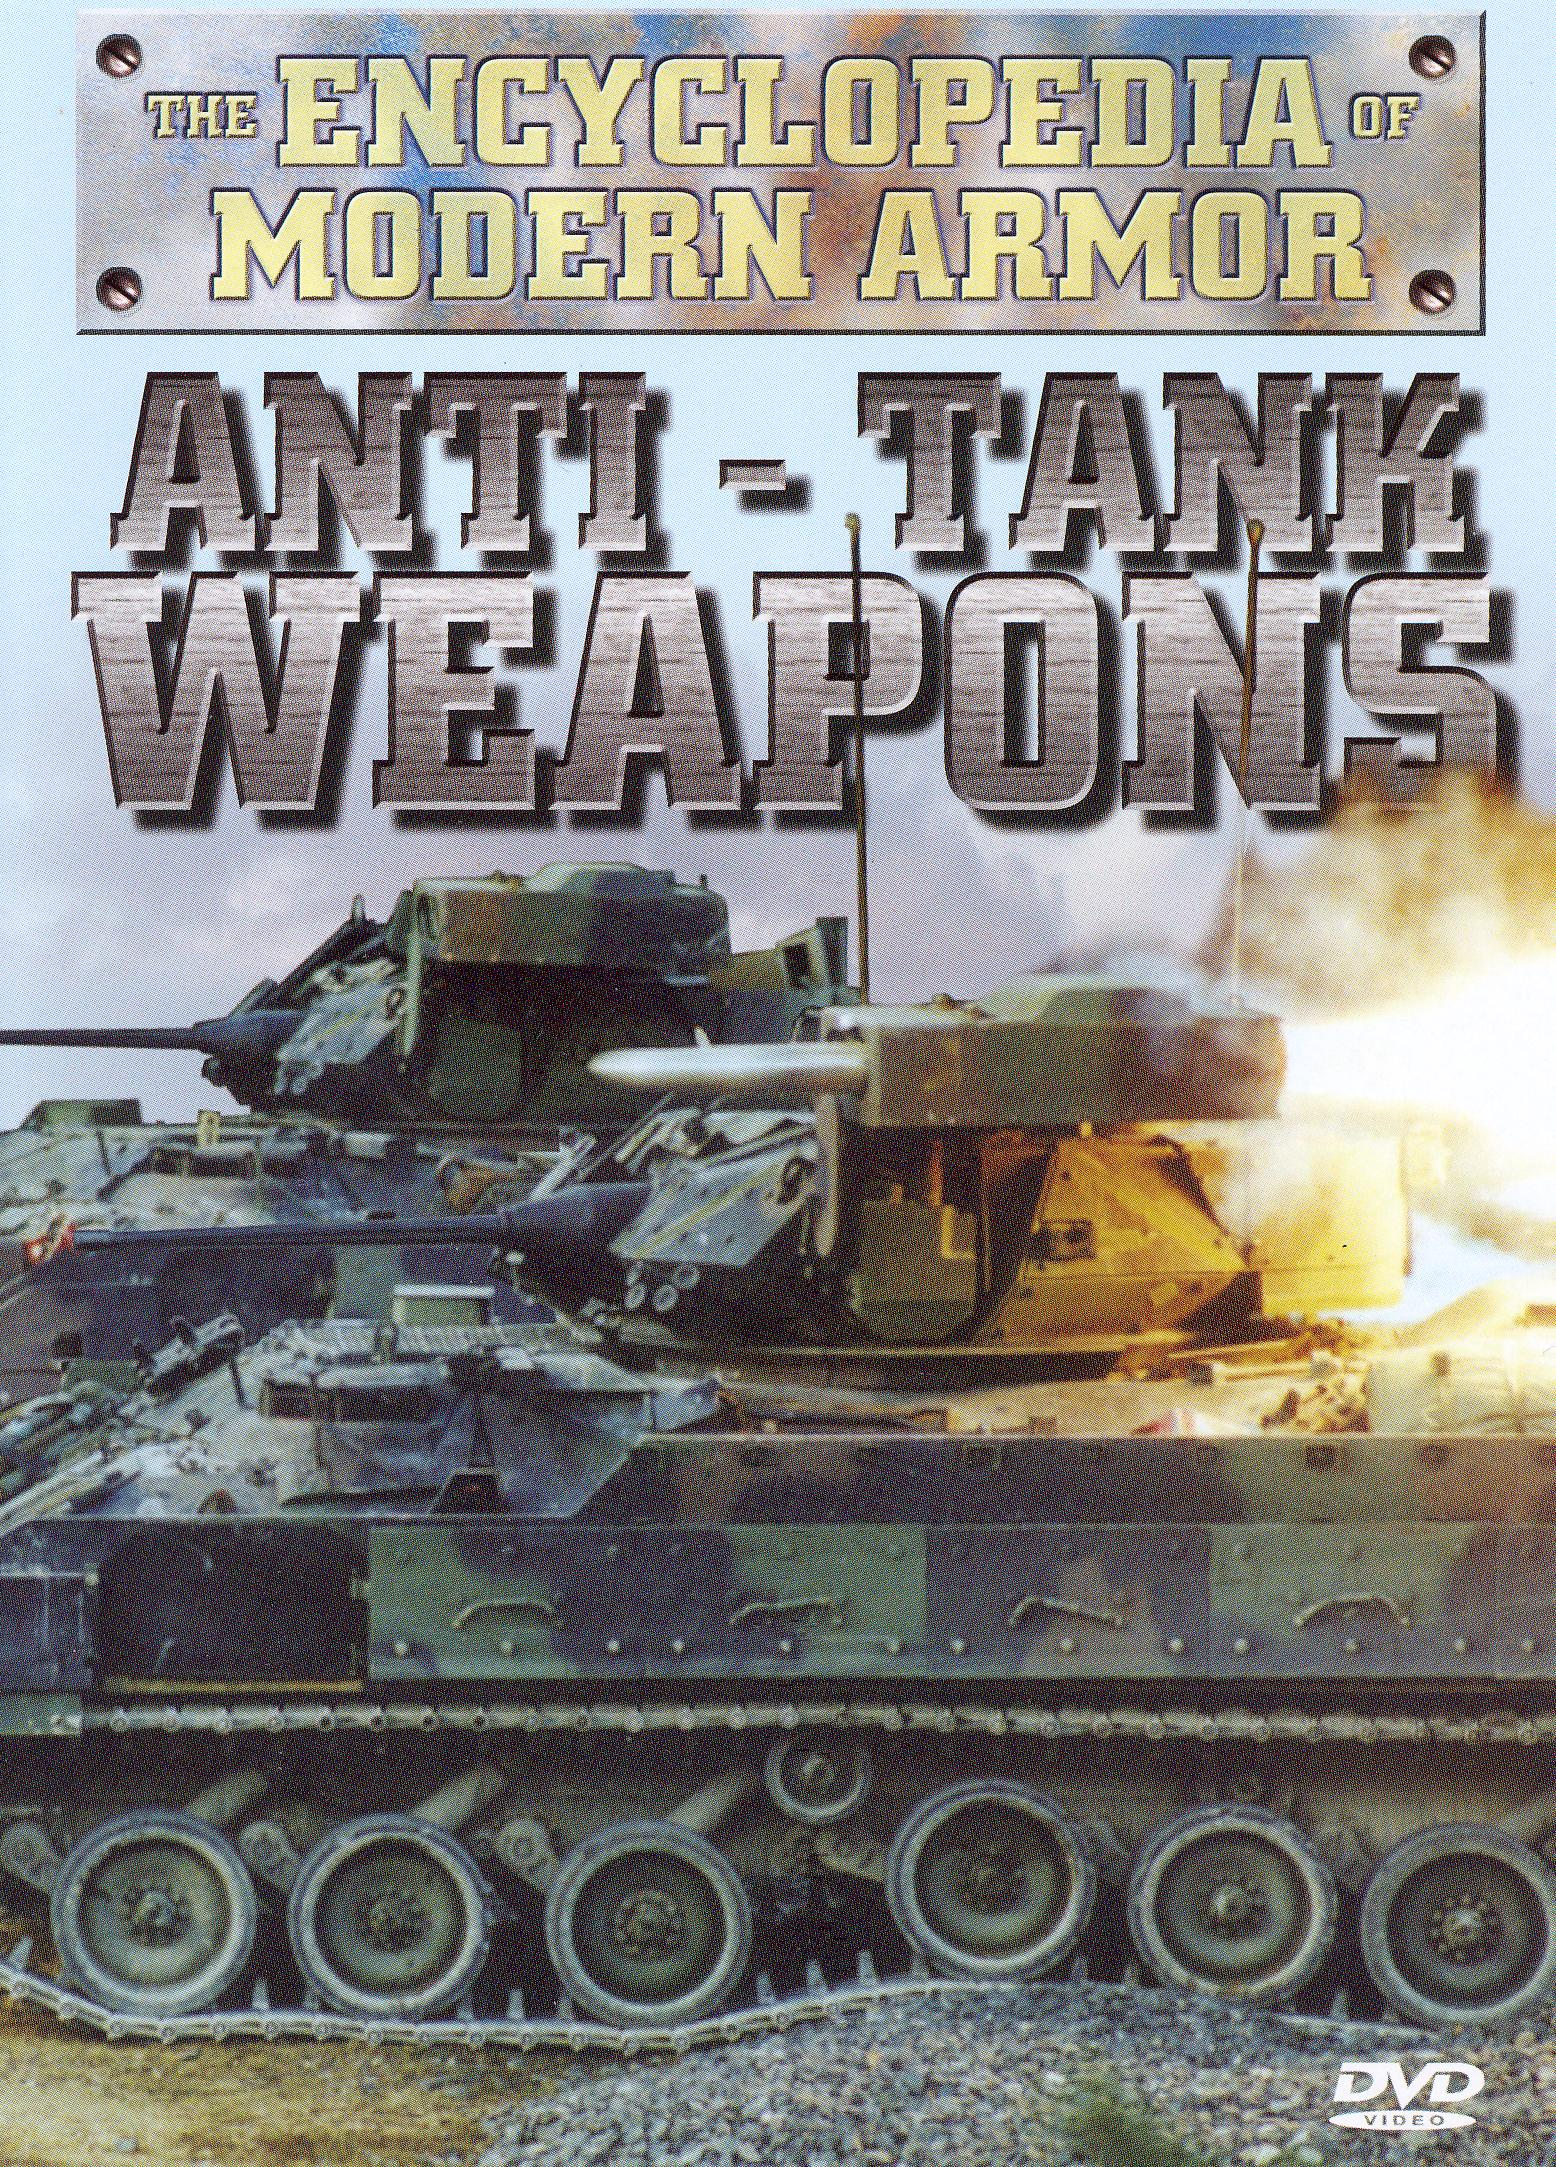 The Encyclopedia of Modern Armor: Anti Tank Weapons